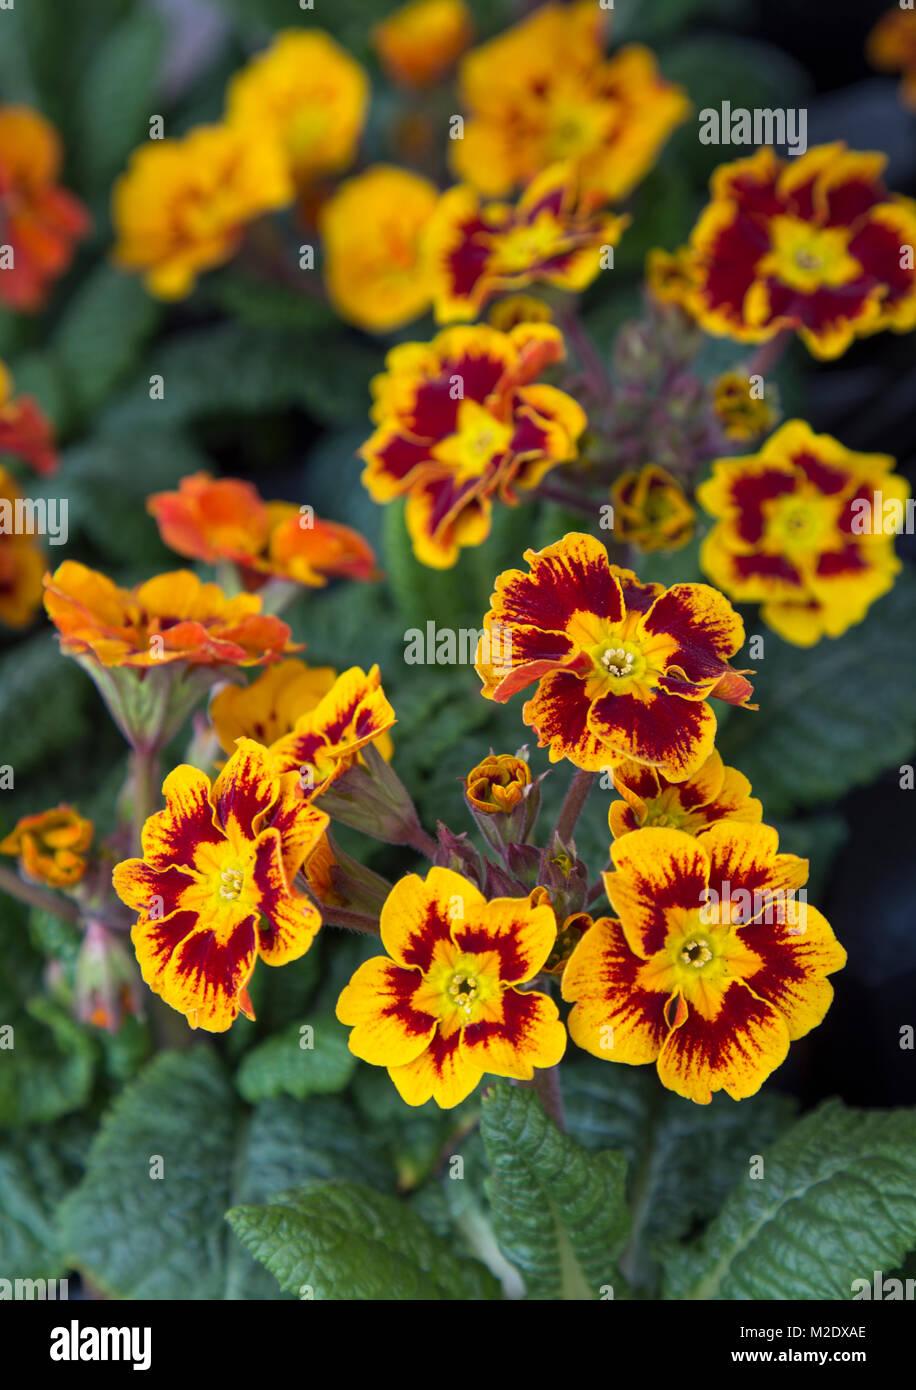 Primula polyantha 'Castillian' Stock Photo